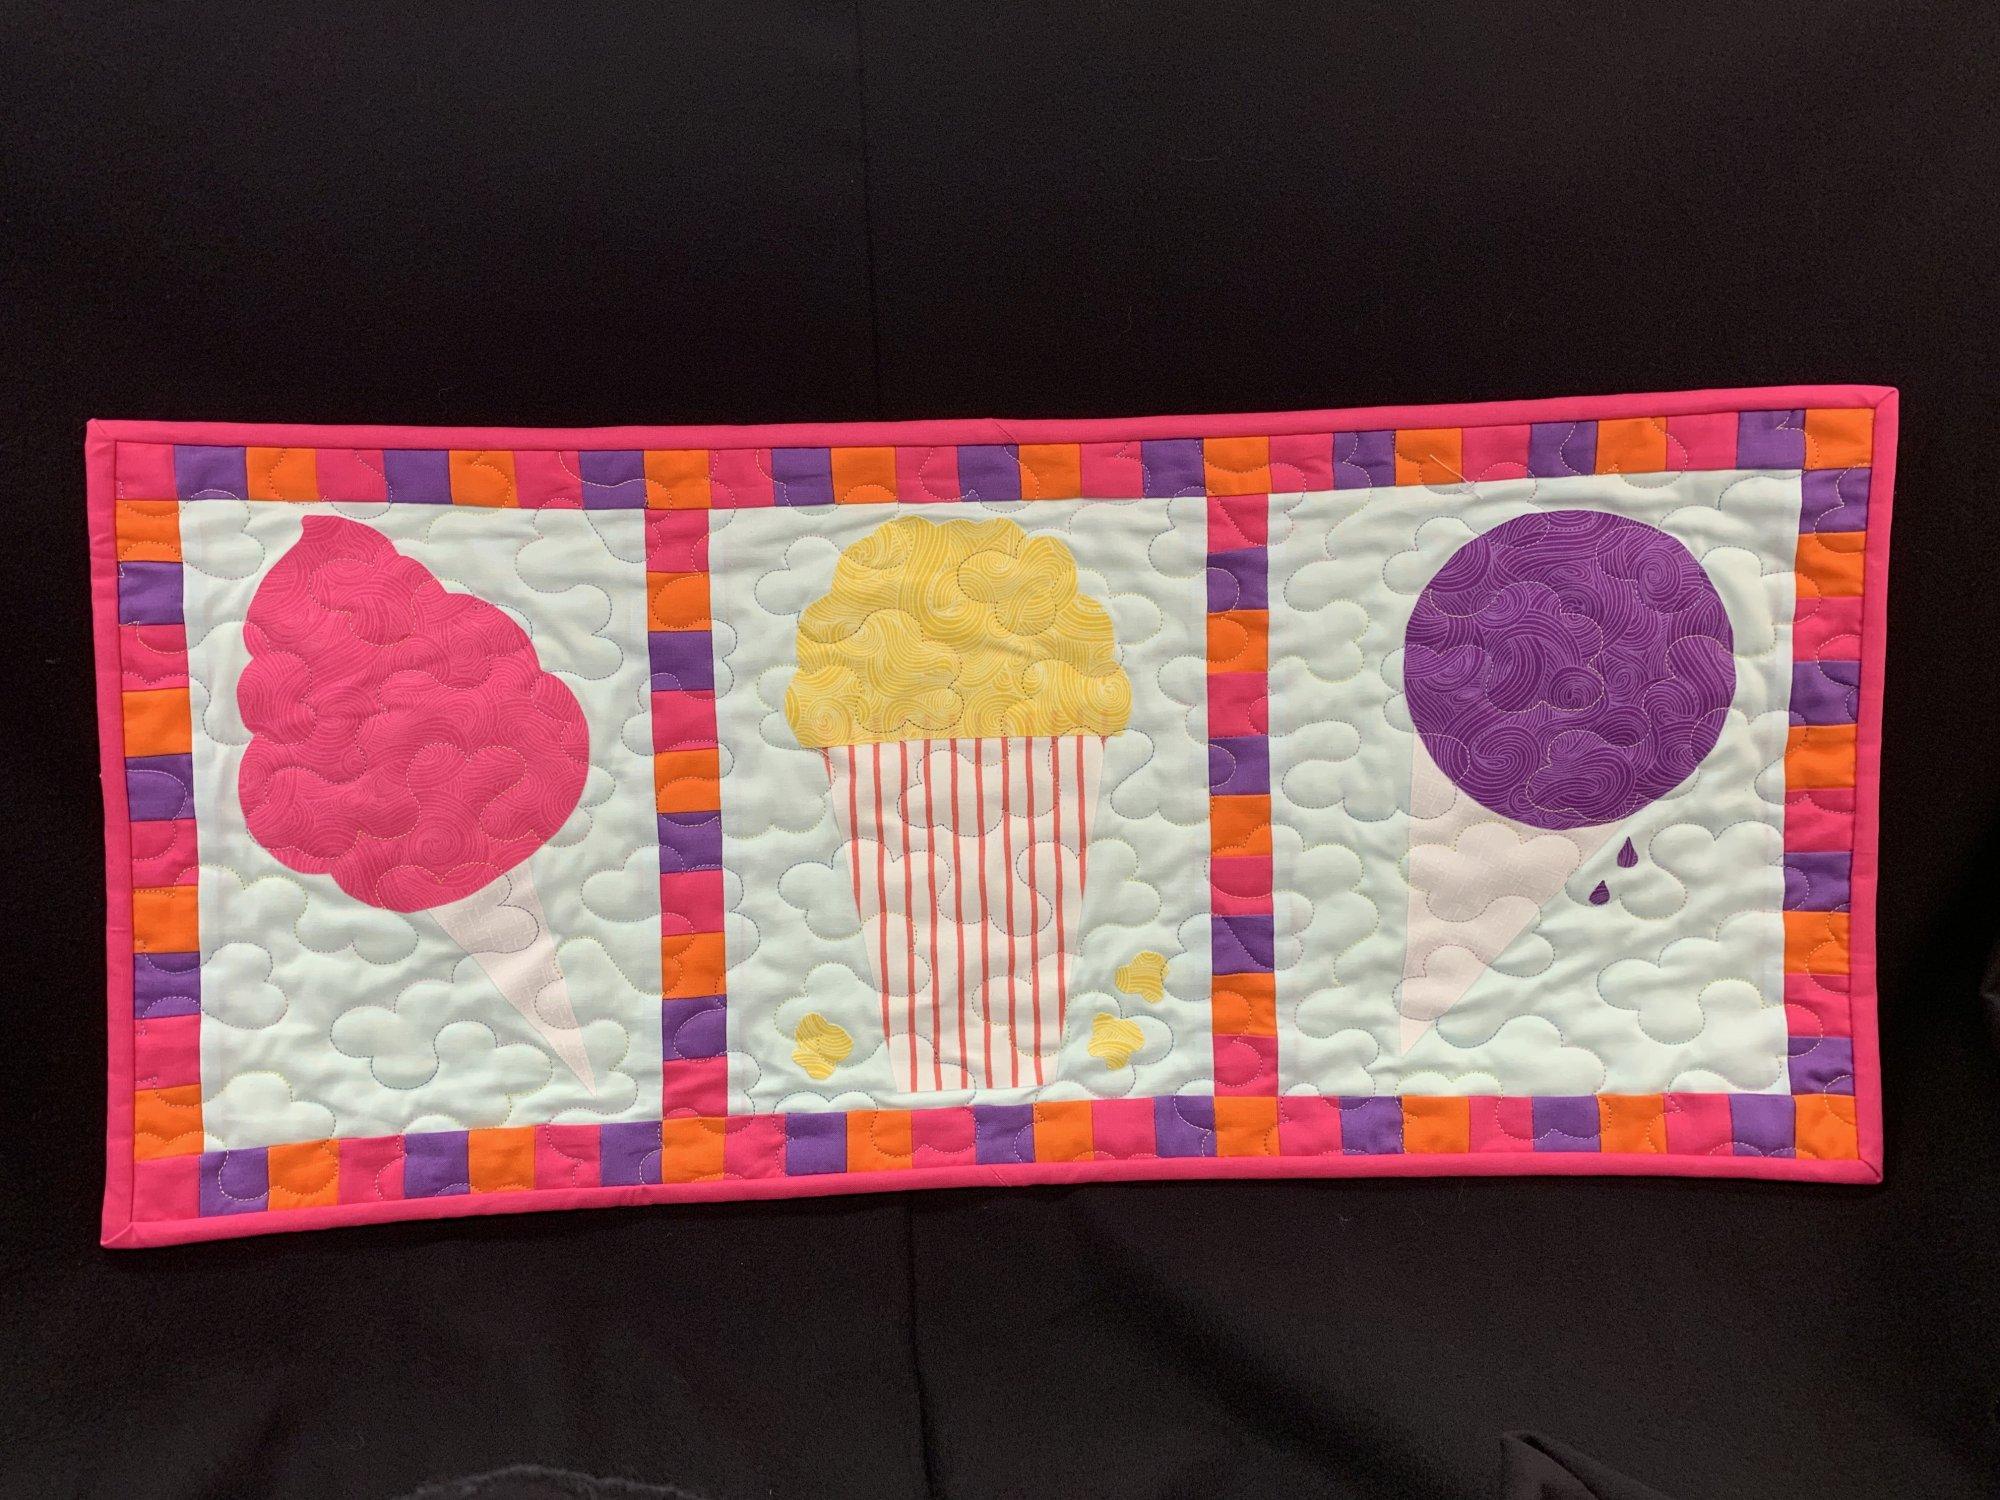 2019 Cotton Candy Fabrics Row by Row Kit - Carnival Themed